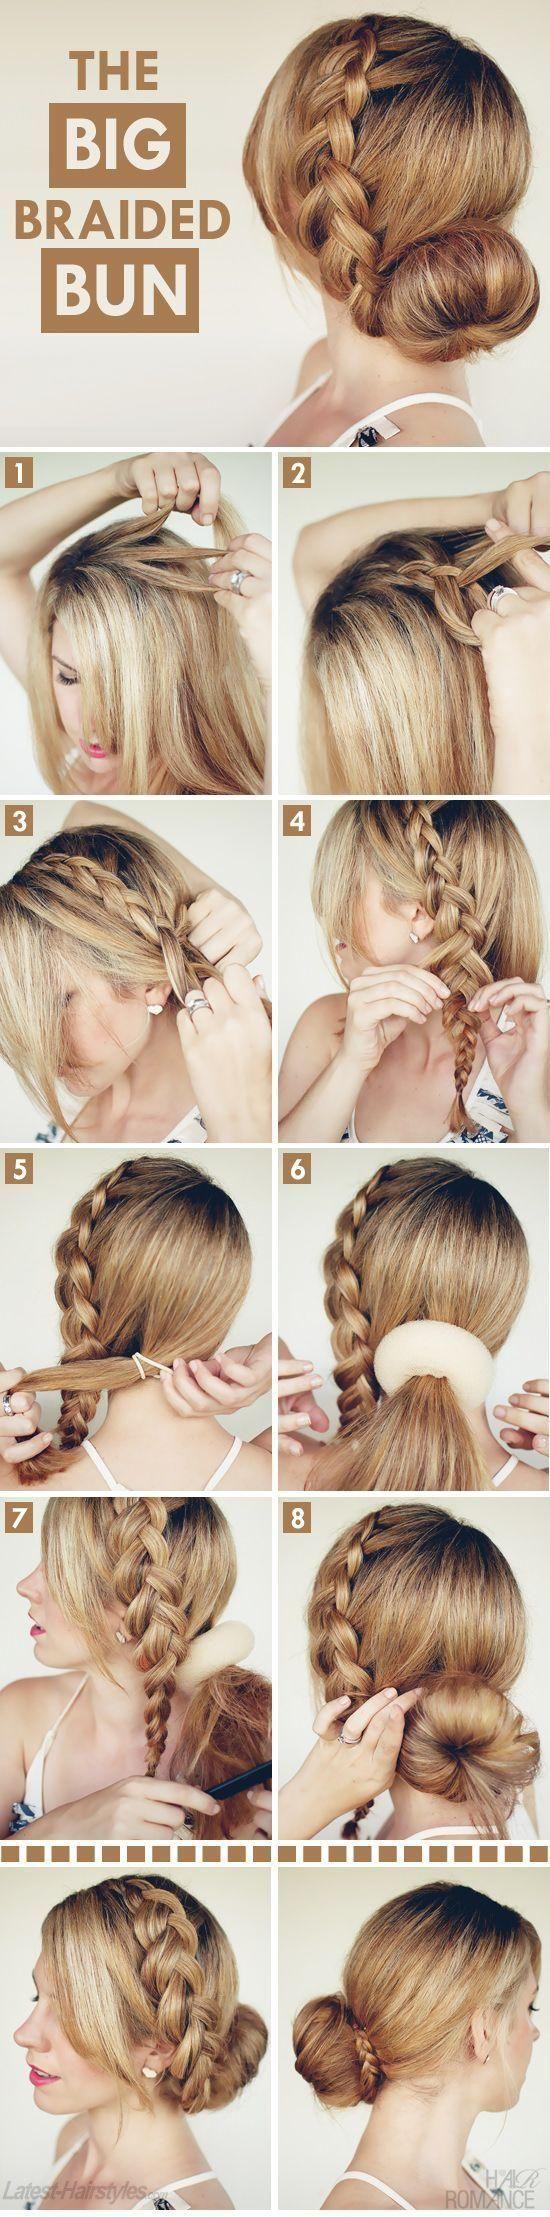 Phenomenal 1000 Ideas About Simple Everyday Hairstyles On Pinterest Short Hairstyles Gunalazisus